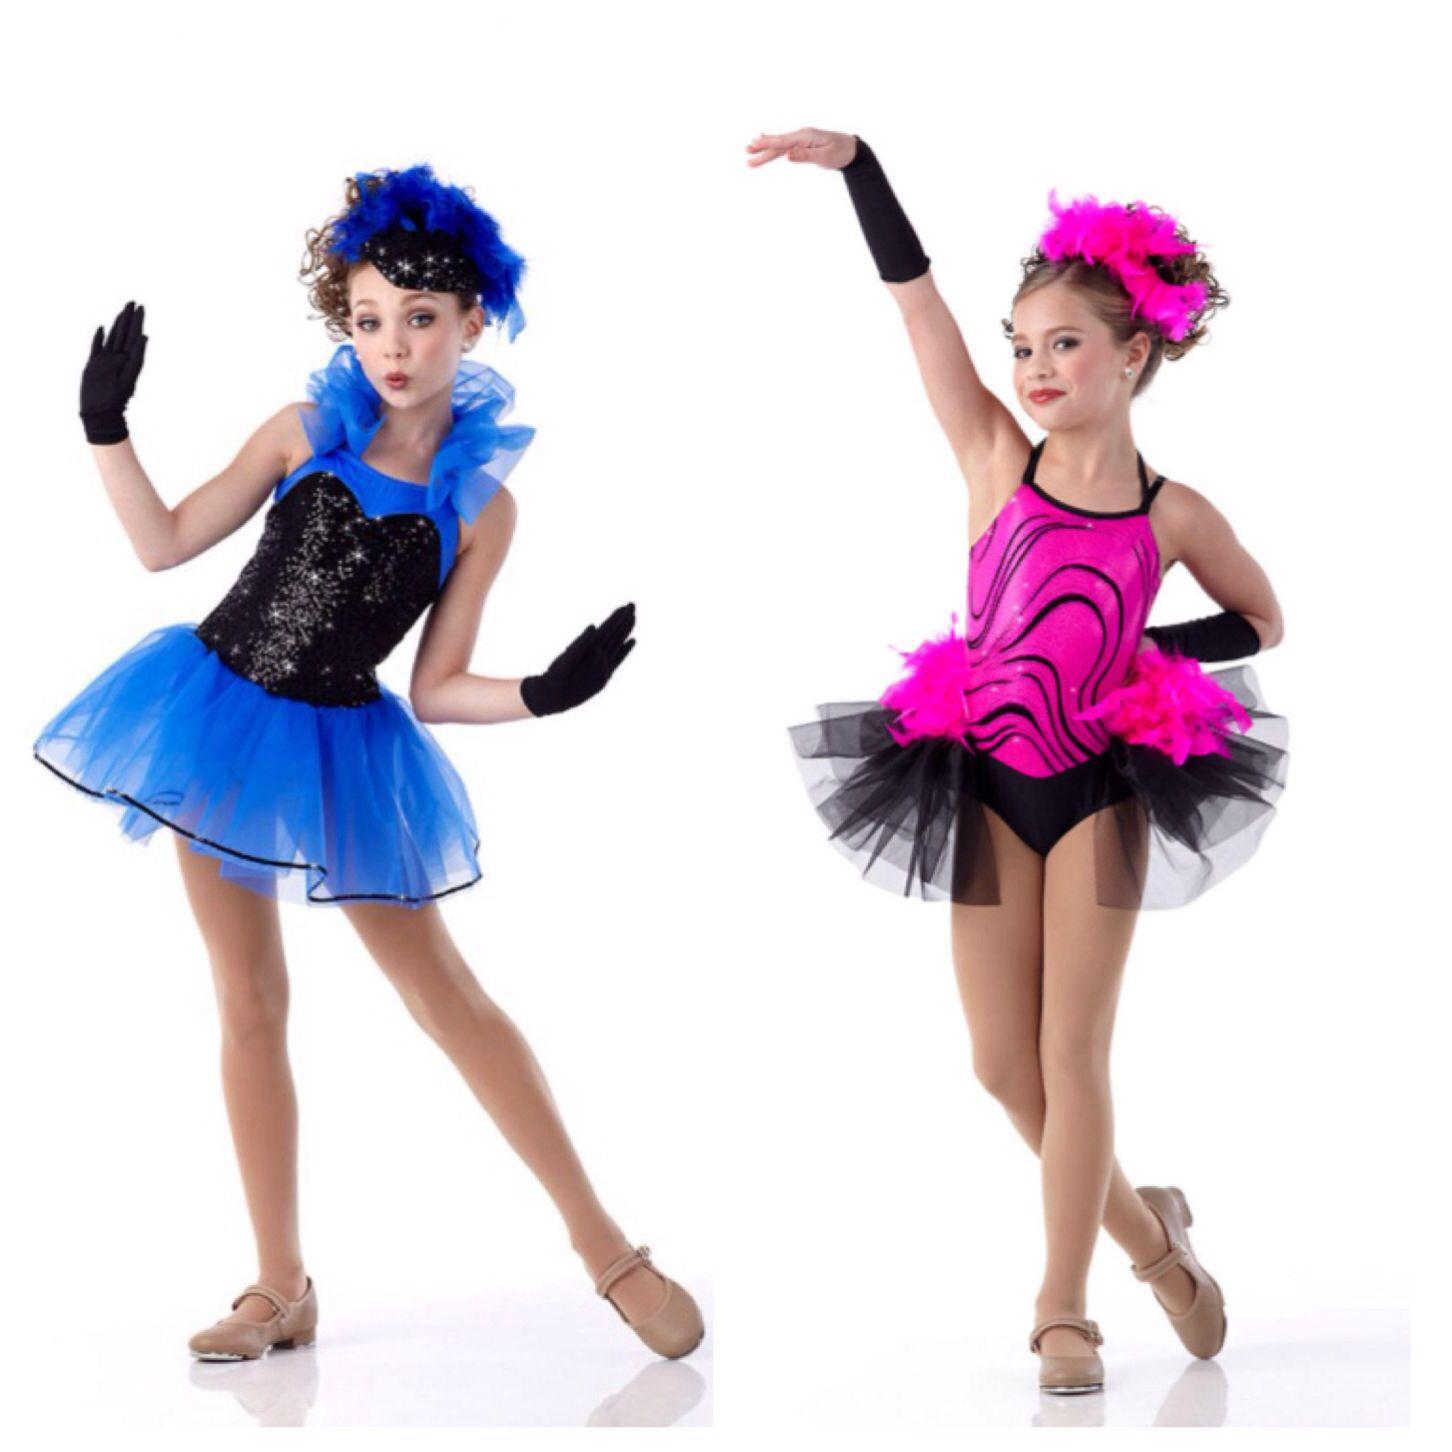 cf0a3aebd252 Maddie and Mackenzie for Cici Dance Wear